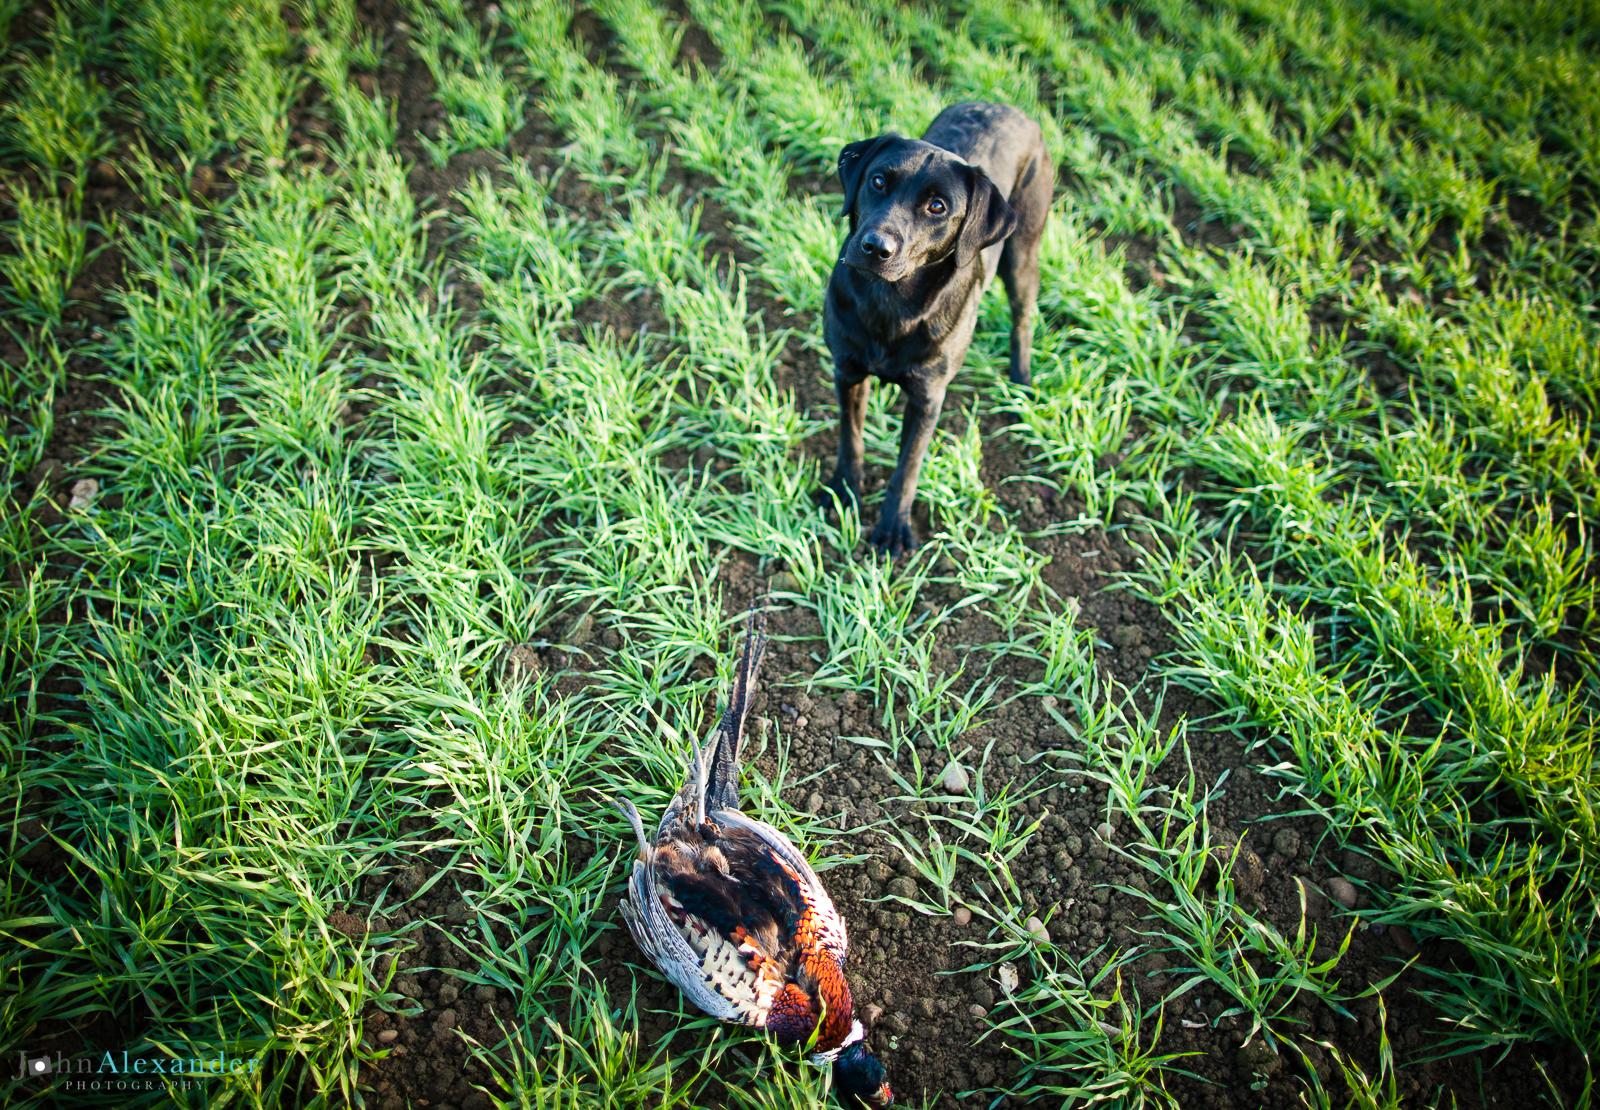 black labrador gun dog presenting cock pheasant bird to owner in field